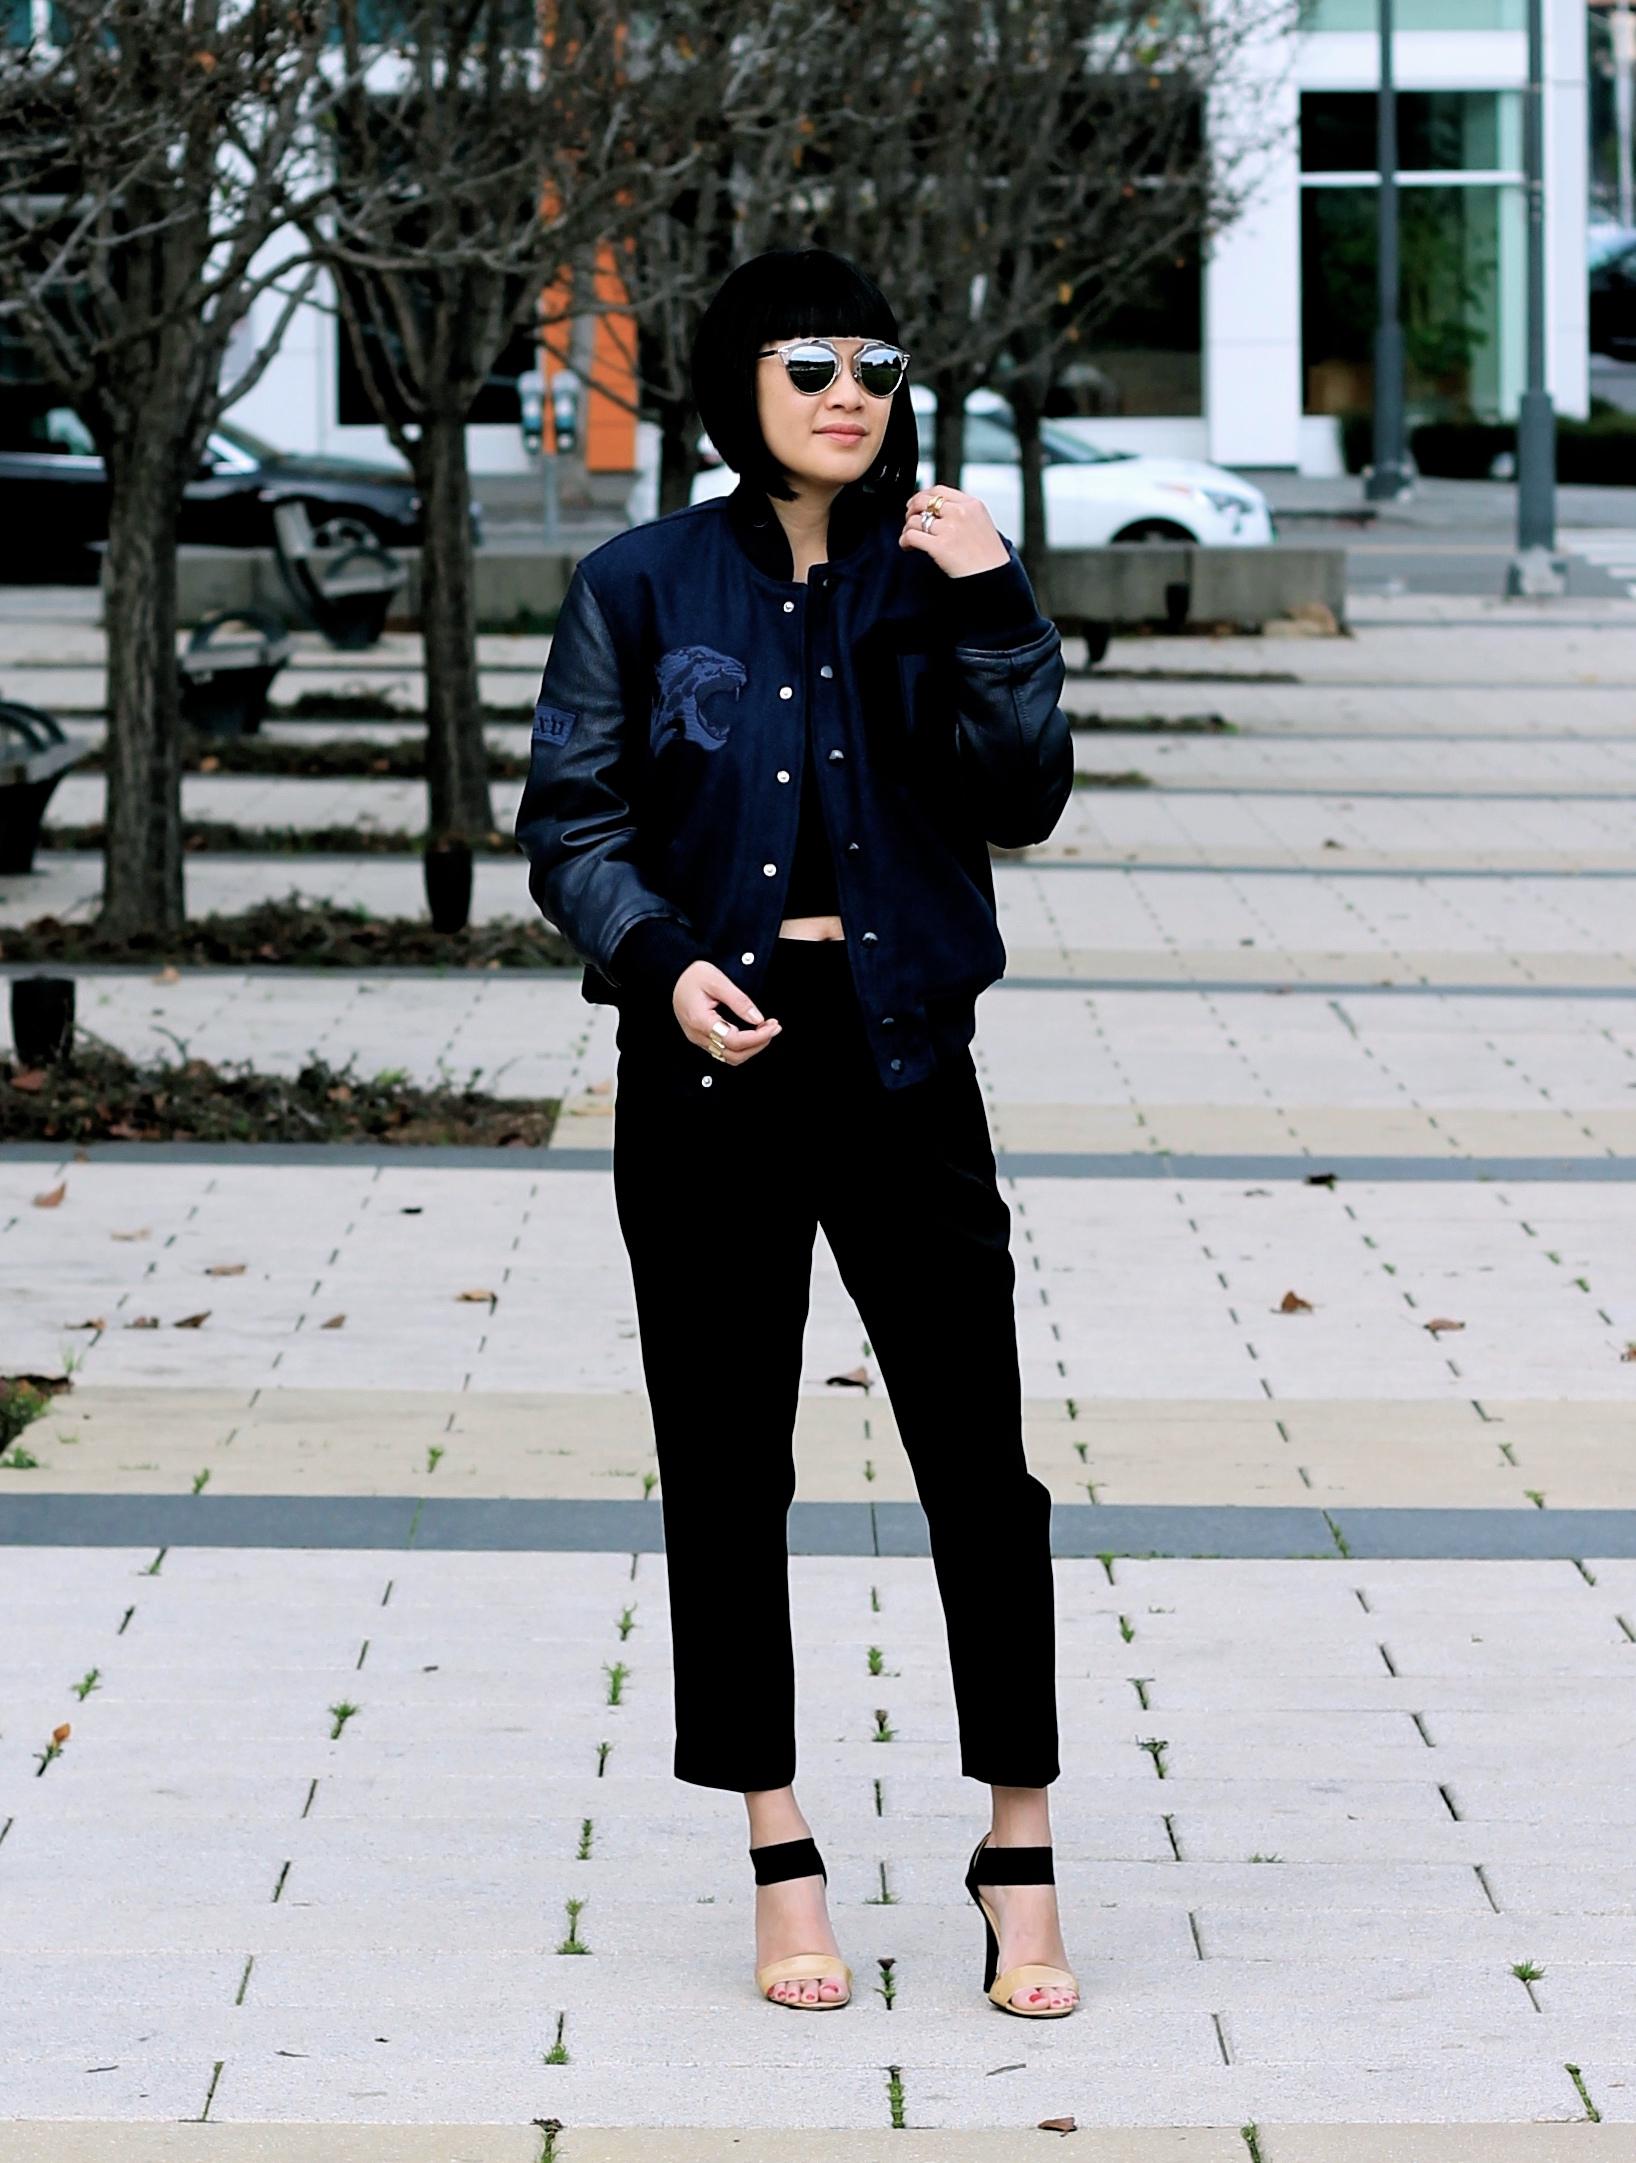 Aritzia jacket and pants, Calvin Klein t-shirt, Michael Kors heels, Dior sunglasses